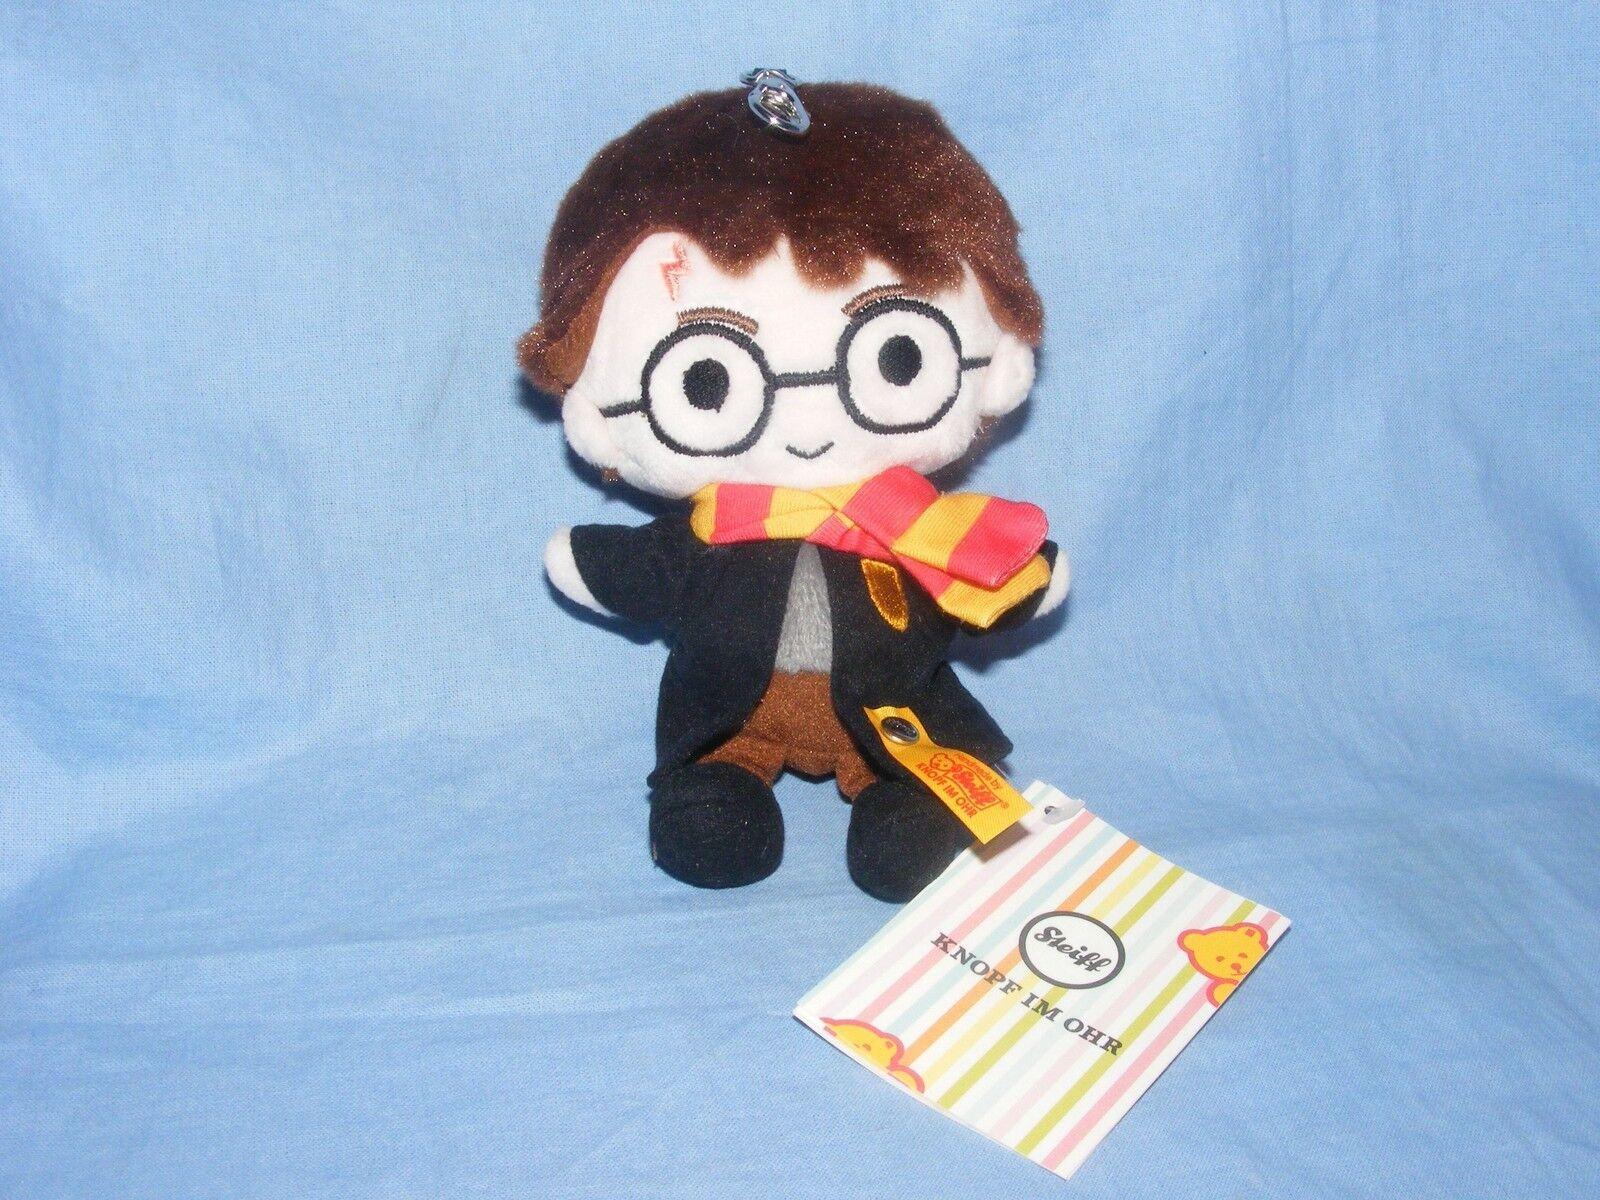 Steiff Schlüsselring Harry Potter Anhänger Neuer Geschenk Handtasche 355110